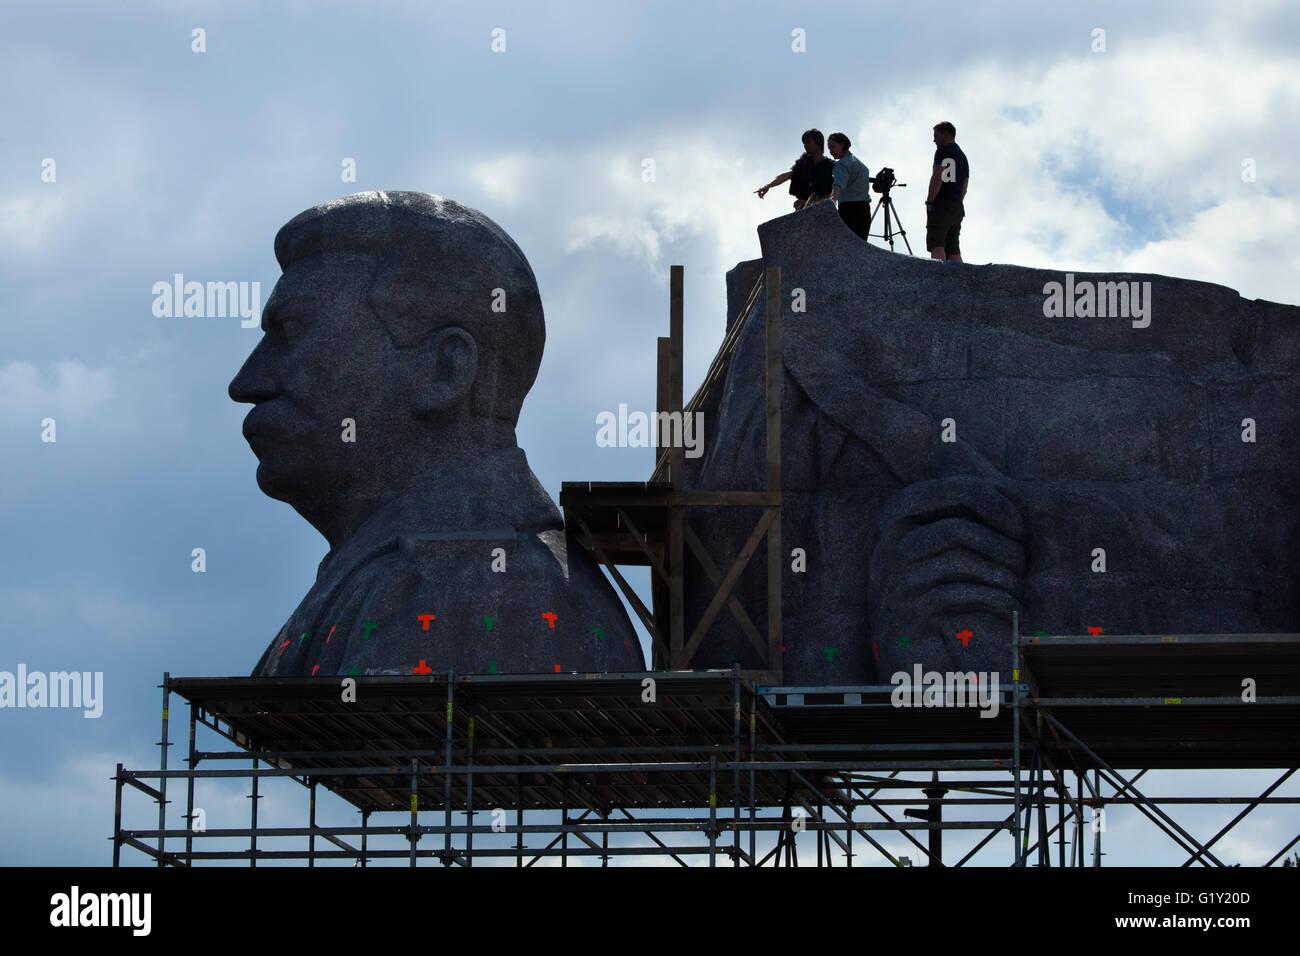 Prague, Czech Republic. 20th May 2016. Huge head of Soviet dictator Joseph Stalin rising over Letna Park in Prague, - Stock Image